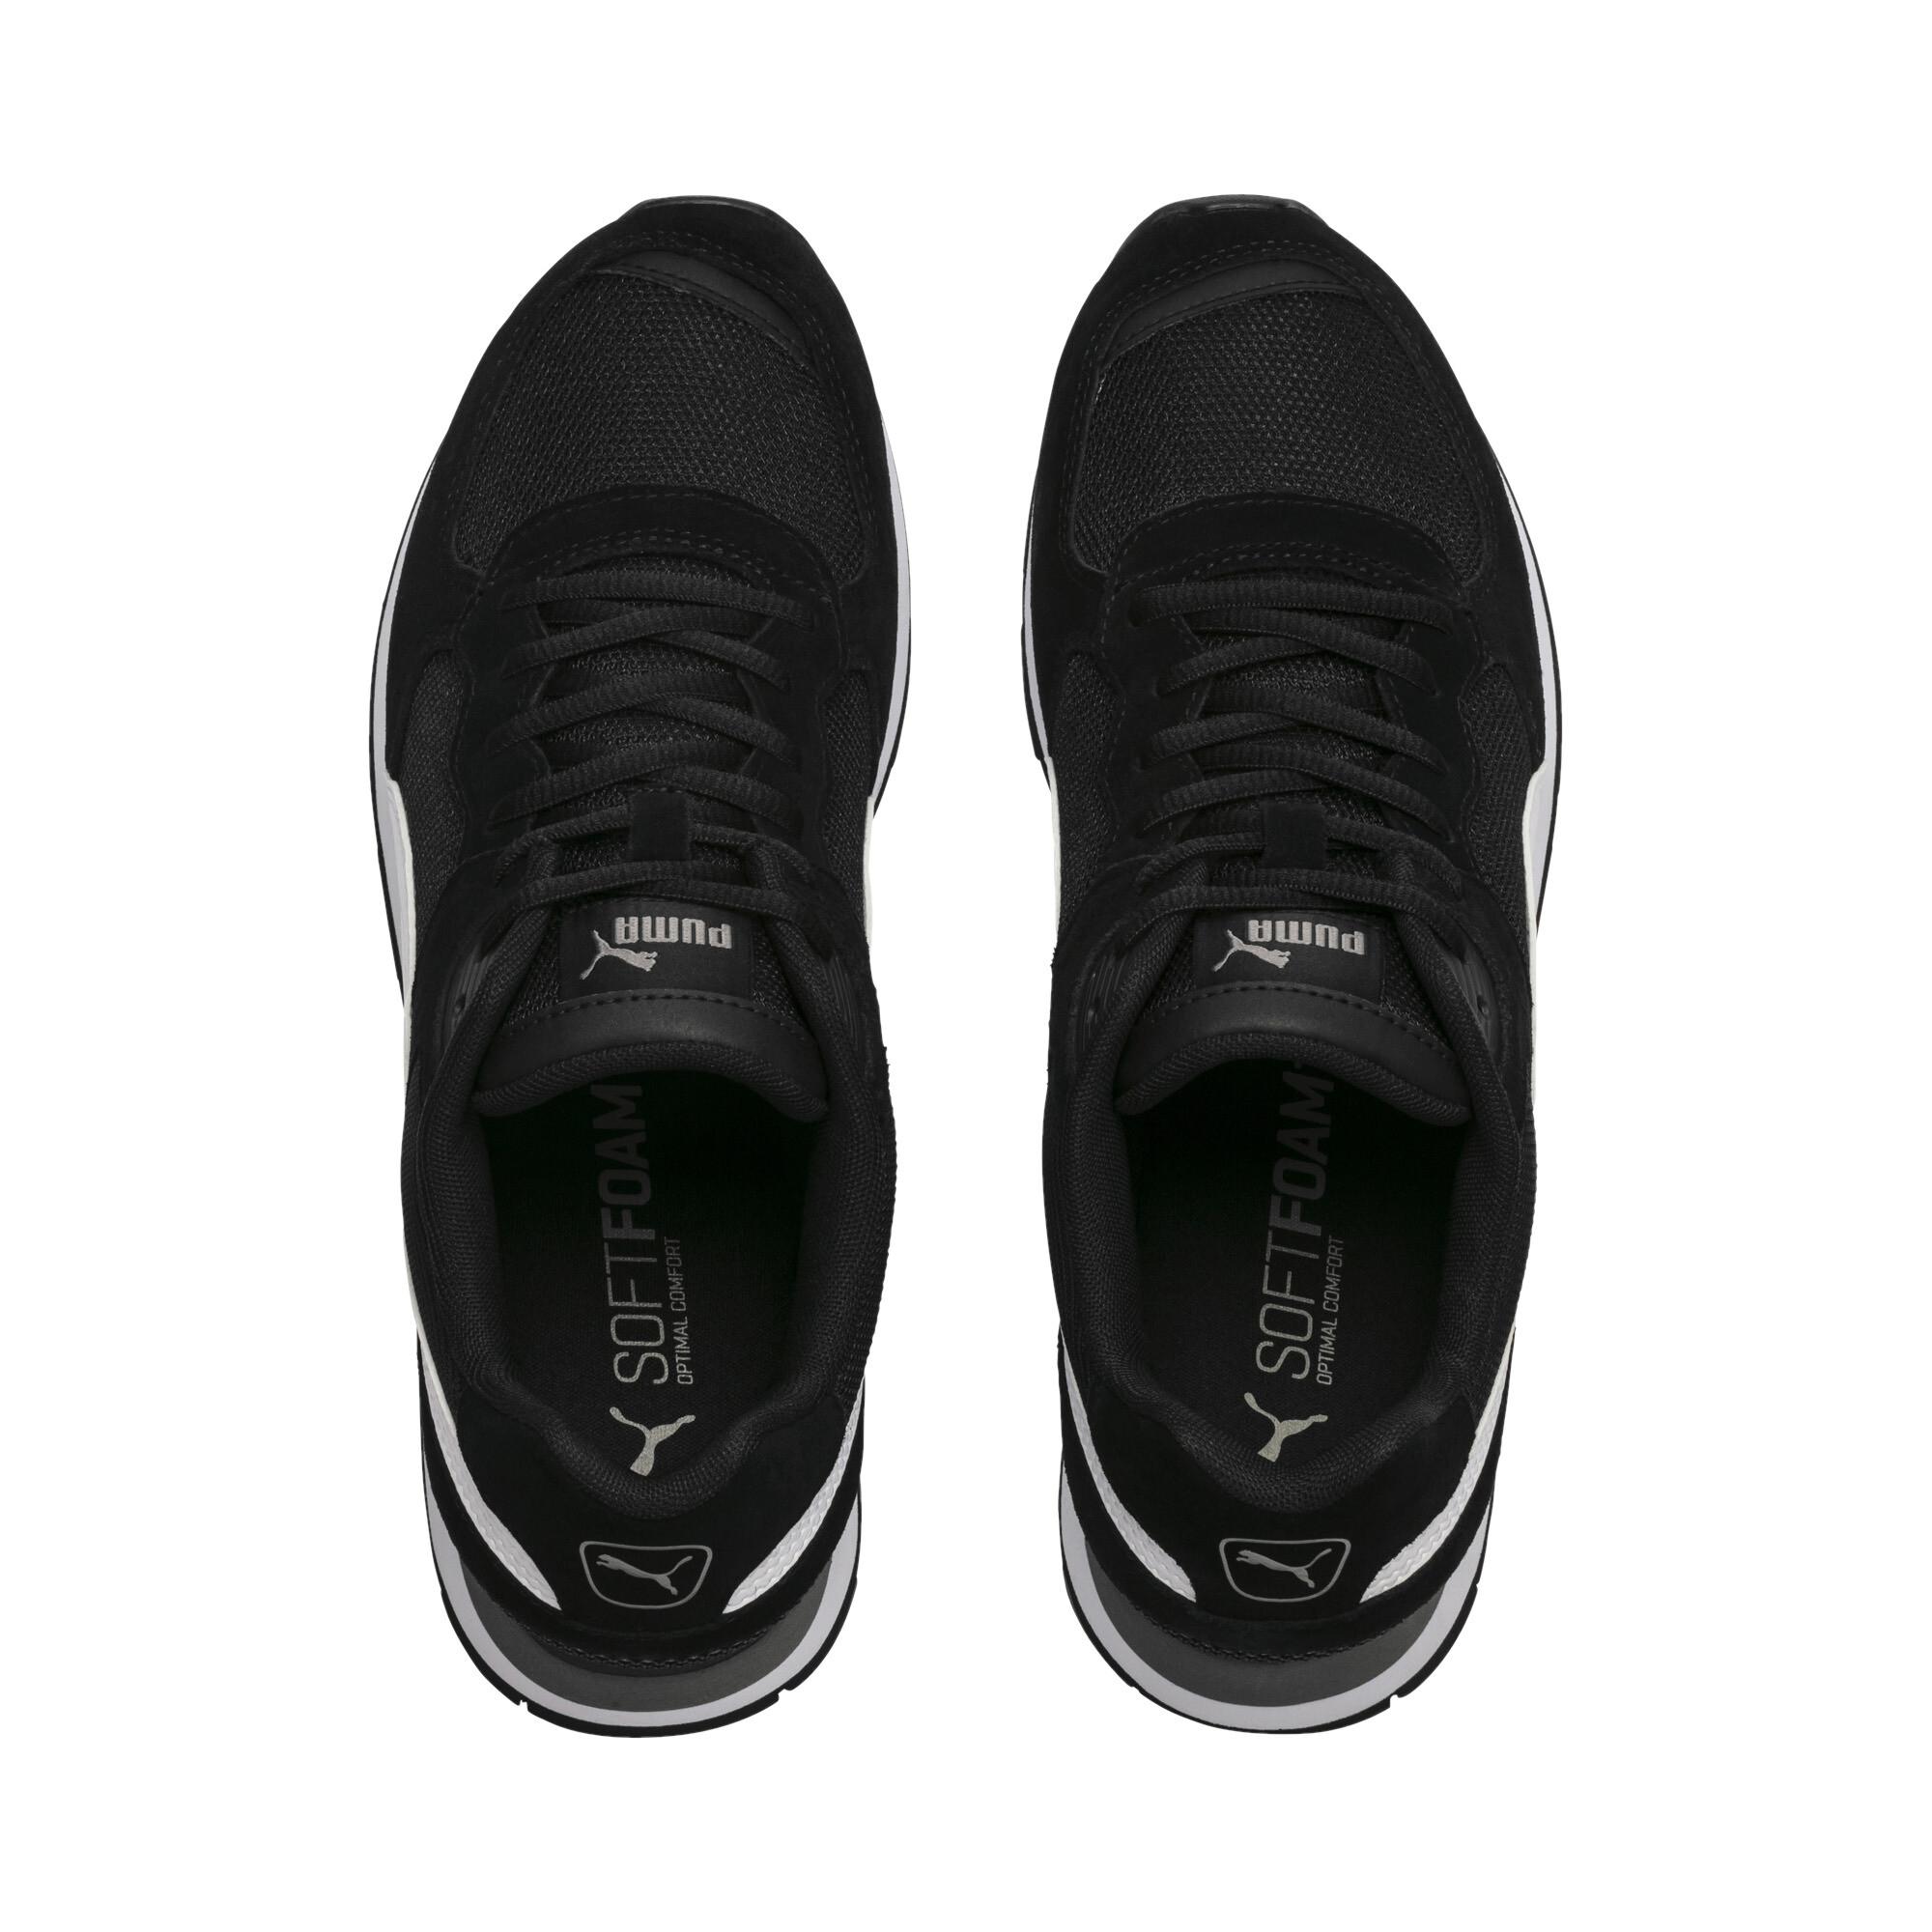 PUMA-Men-039-s-Vista-Sneakers thumbnail 21